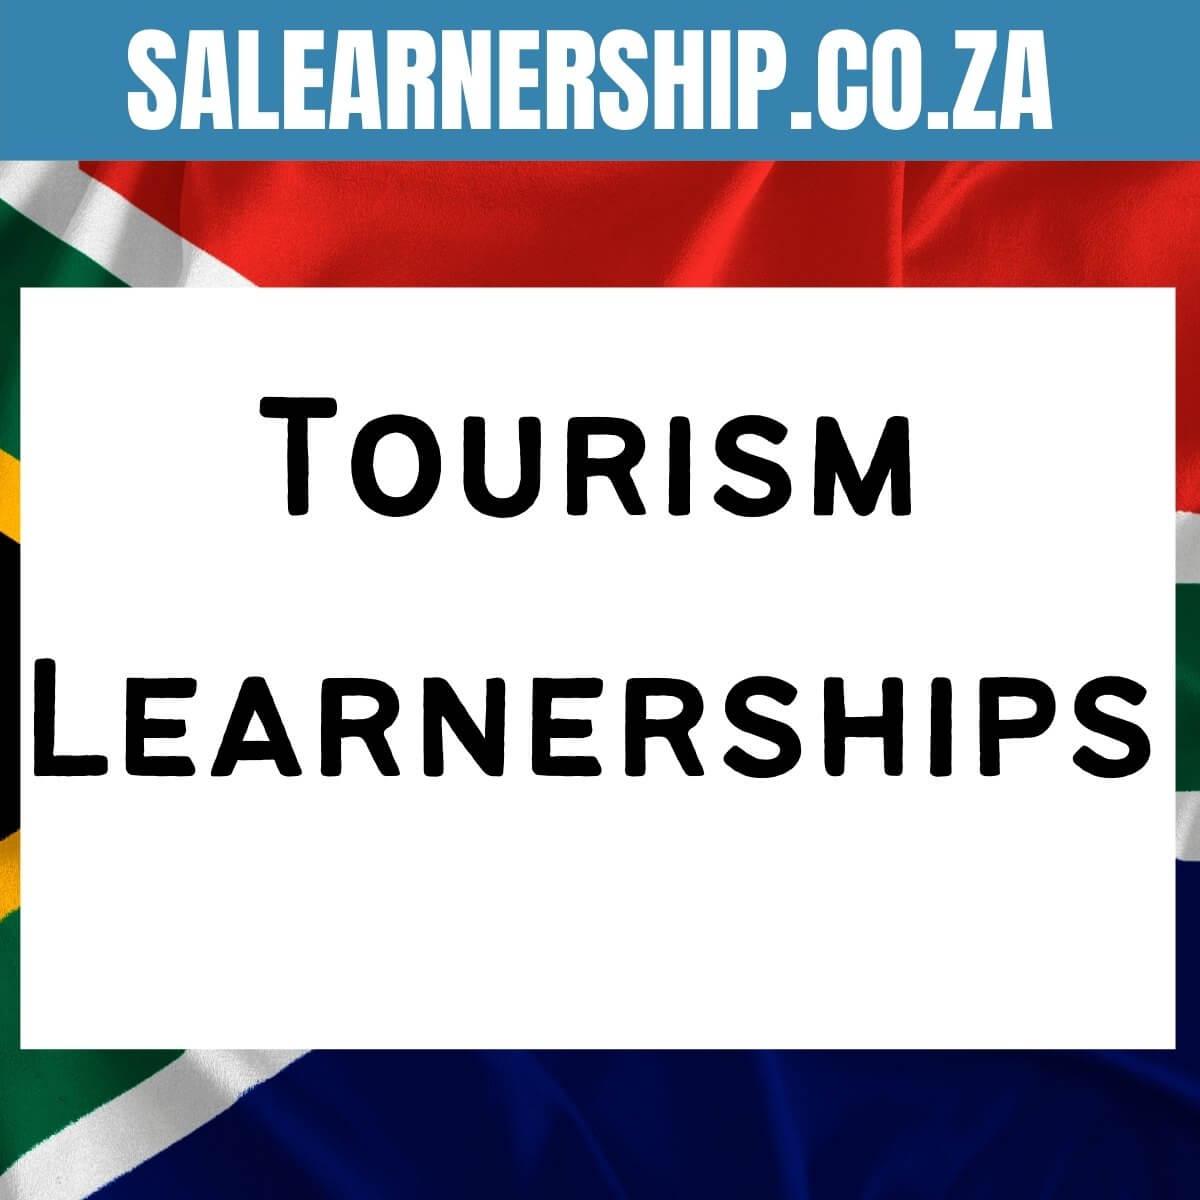 tourism learnerships